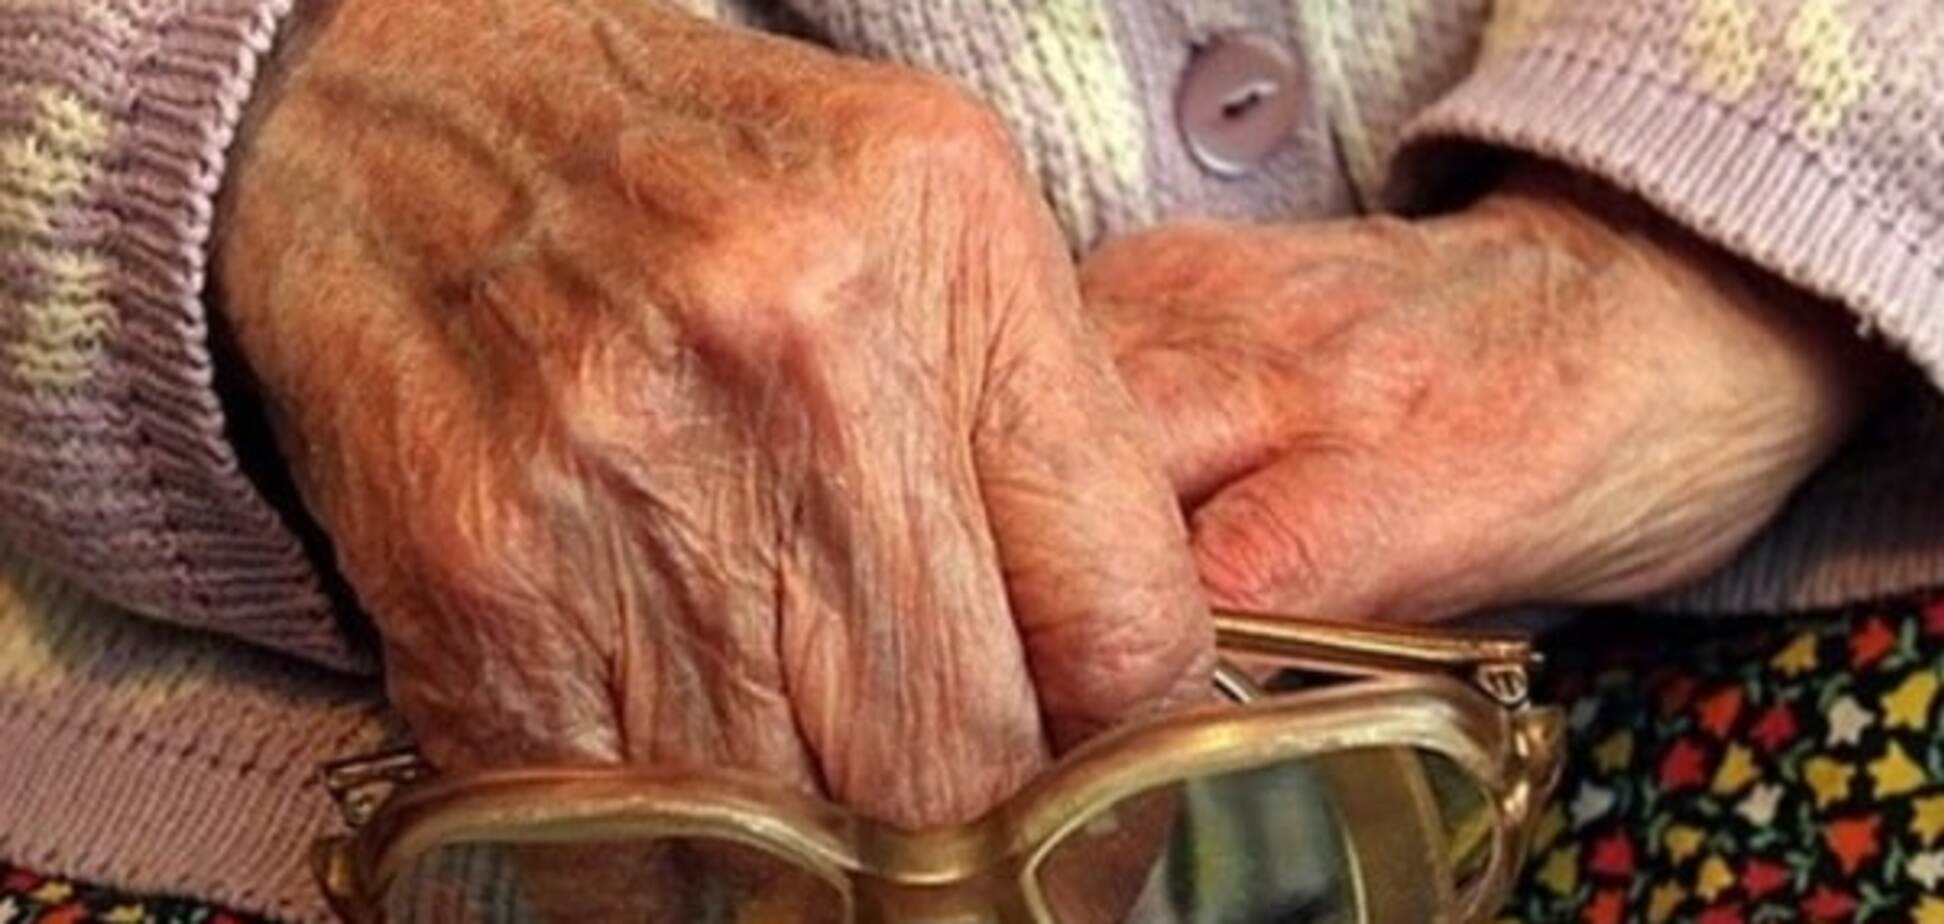 Мошенники, под видом сотрудников 'Запорожгаза', грабят пенсионеров